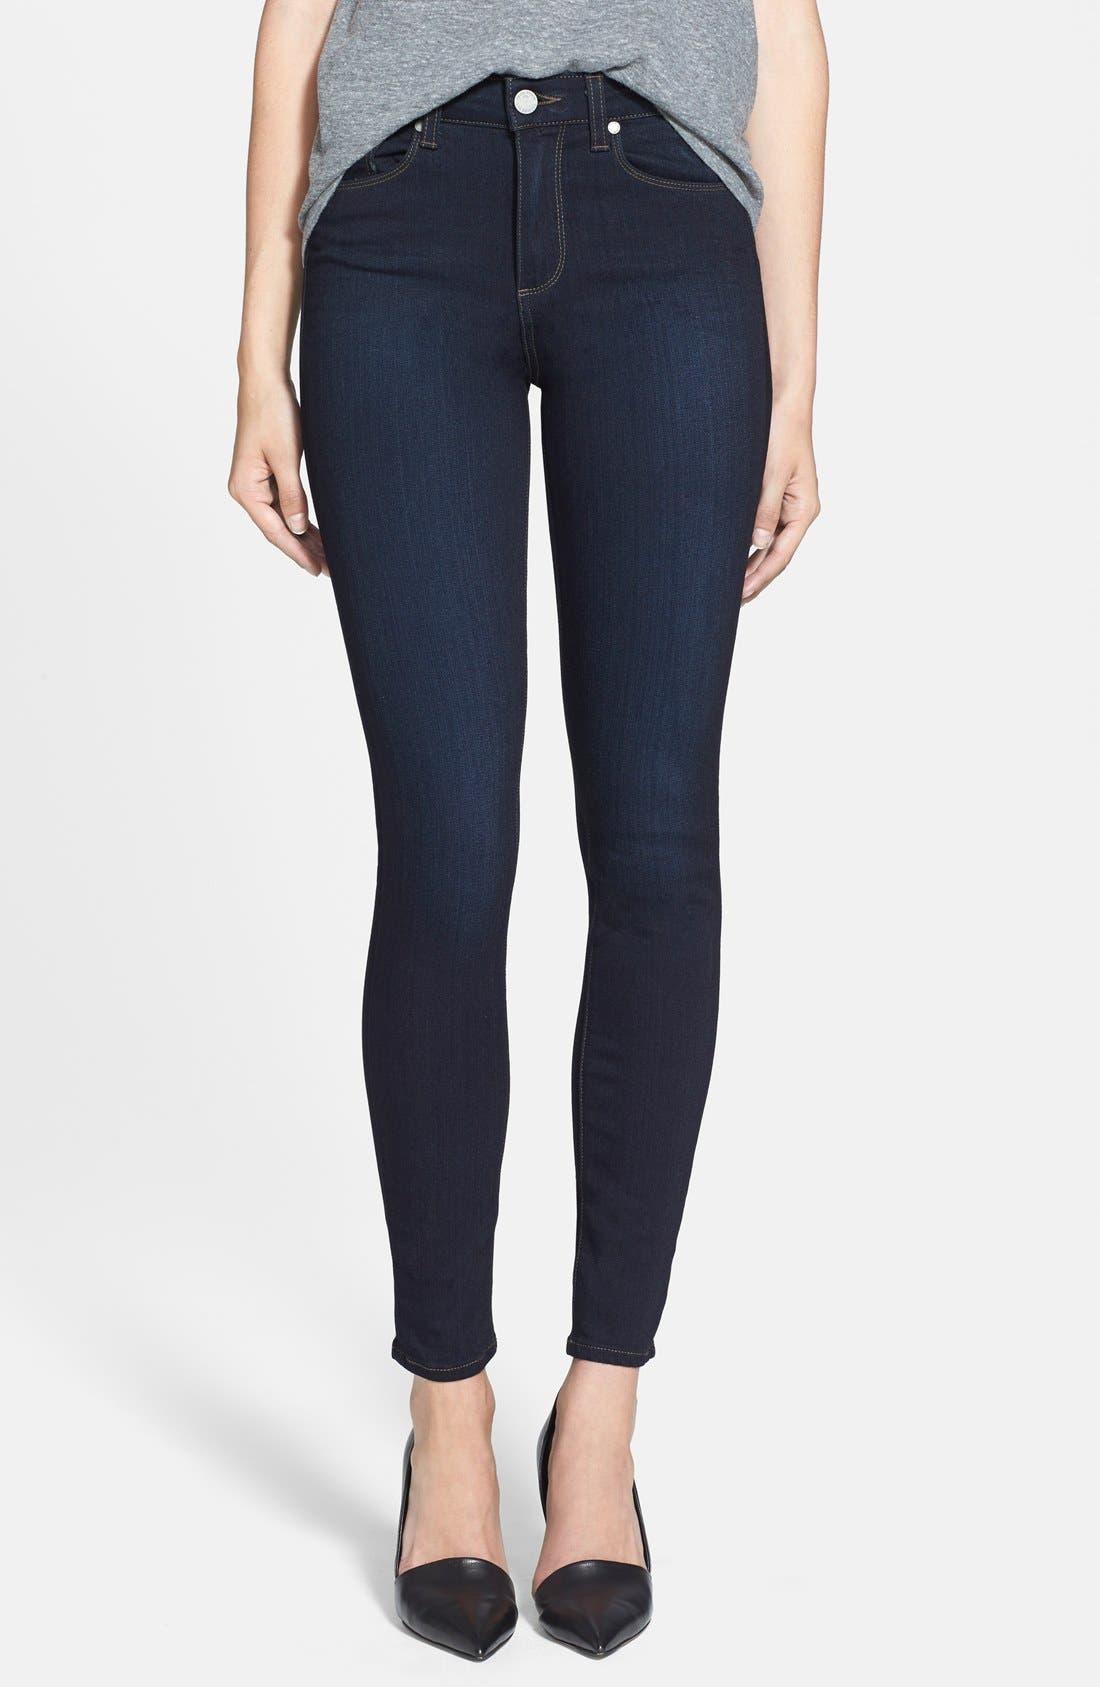 PAIGE, Transcend - Hoxton High Waist Ultra Skinny Jeans, Main thumbnail 1, color, MONA